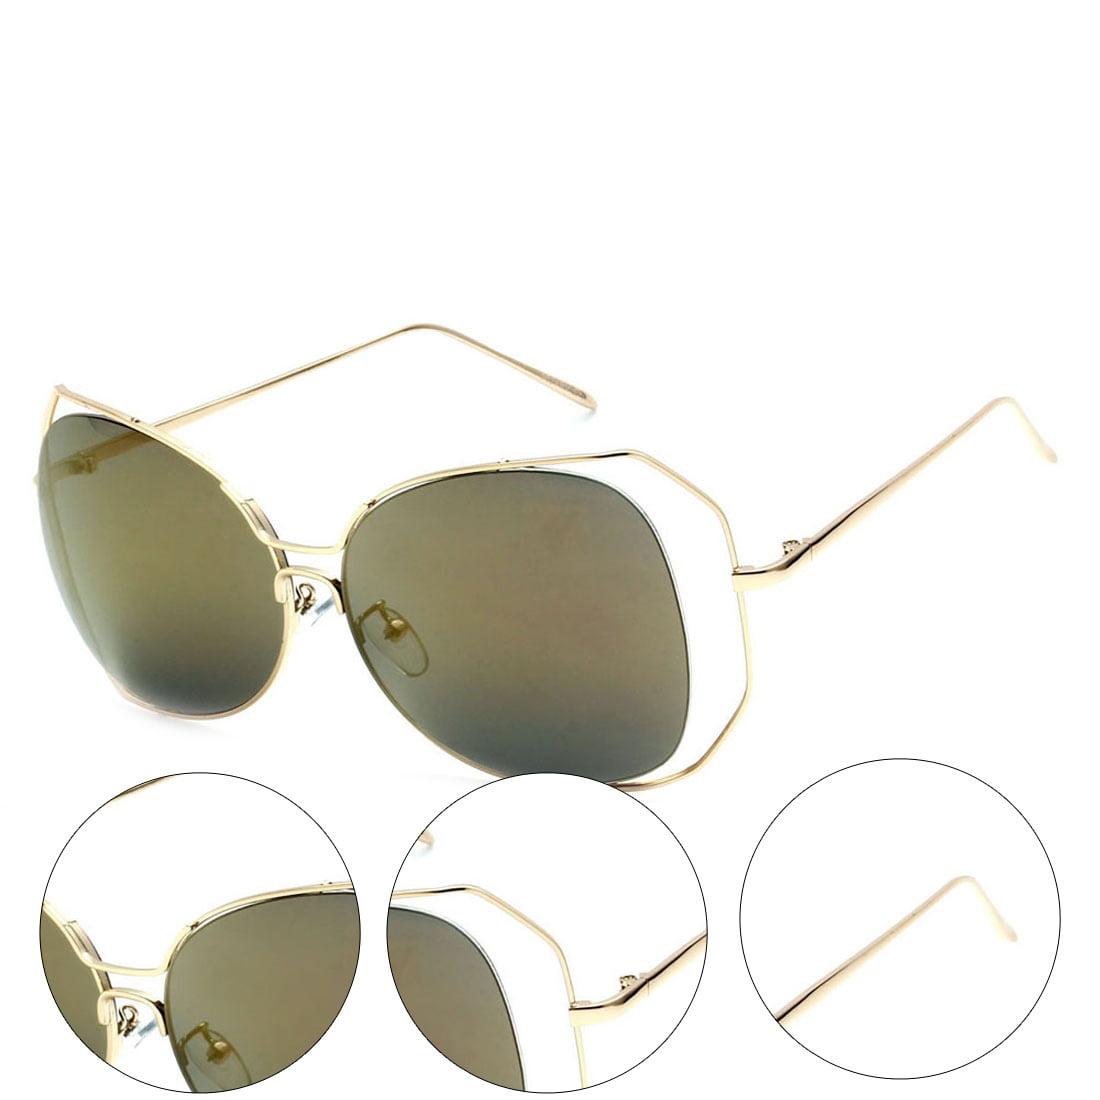 MLC Eyewear Urban Trendy Double Frame Oversized Women Sunglasses